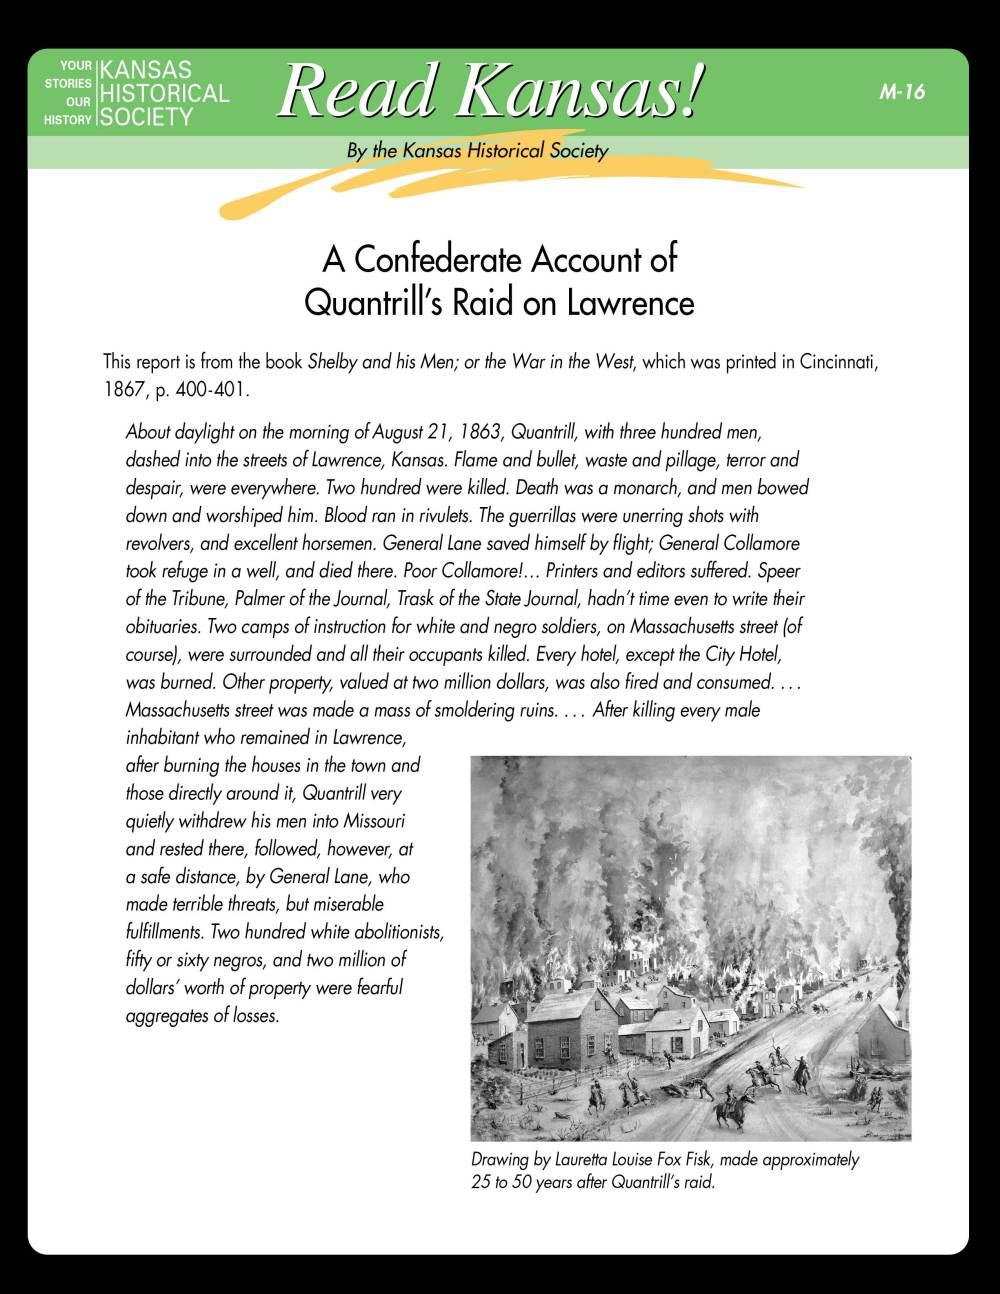 medium resolution of Read Kansas! Middle School - M-16 The Civil War Comes to Kansas:  Quantrill's Raid on Lawrence - Kansas Historical Society